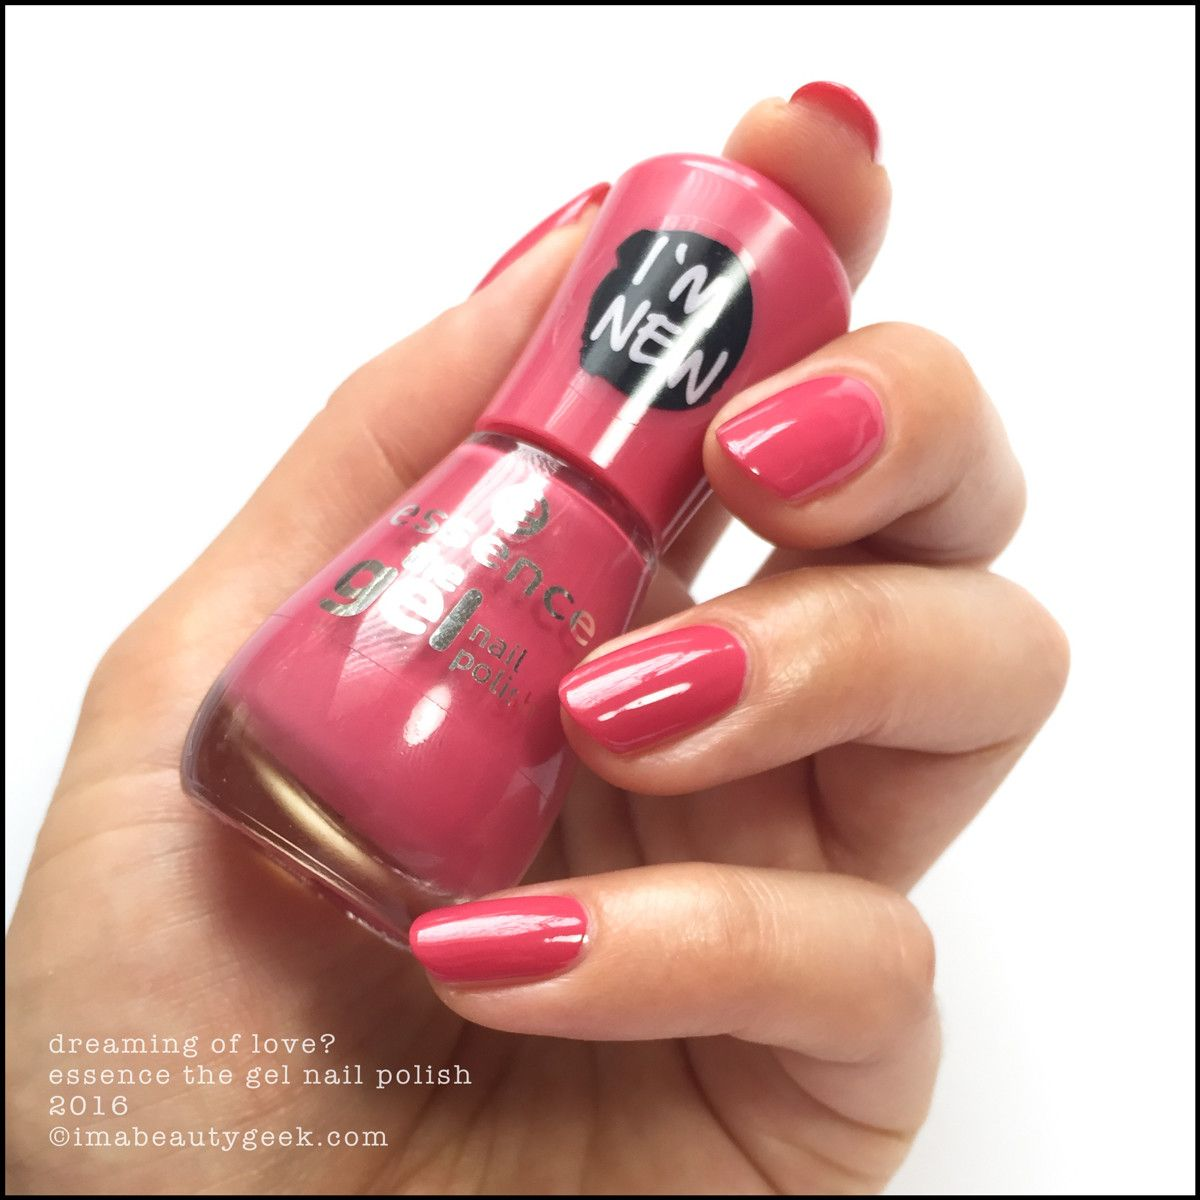 Essence The Gel Nail Polish 87 Gossip Girl - To Bend Light